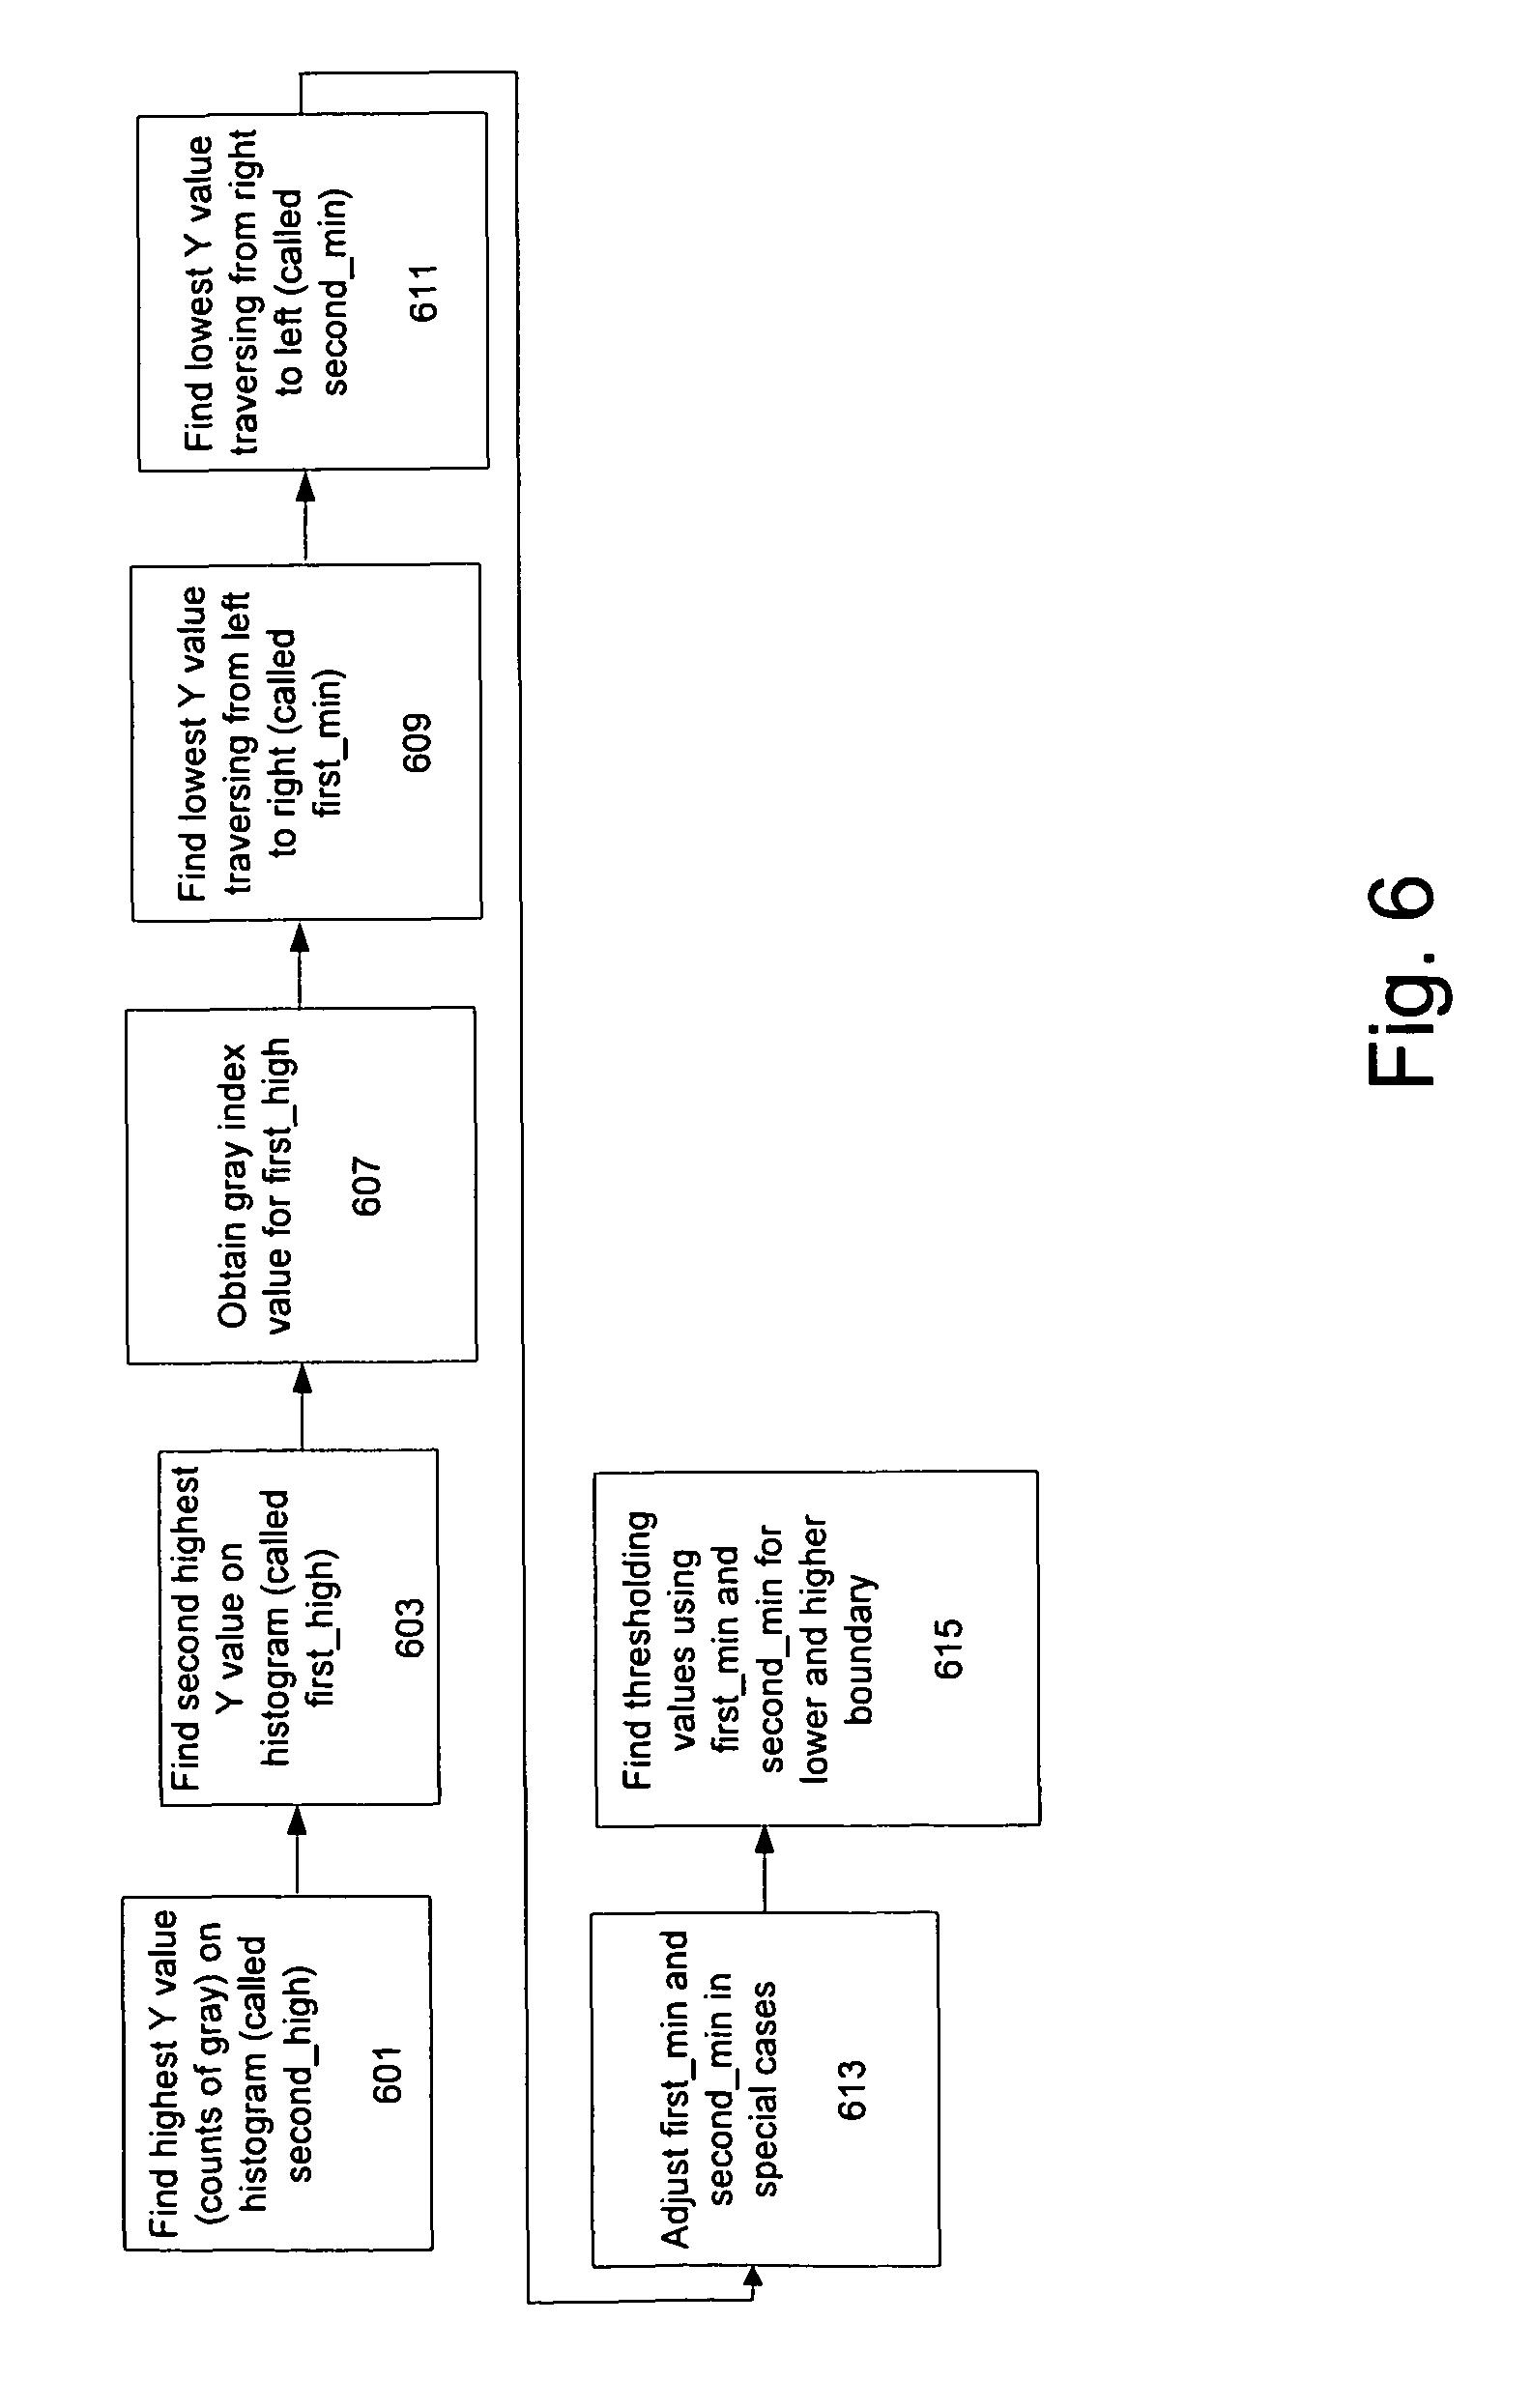 Patent US 8,391,599 B1